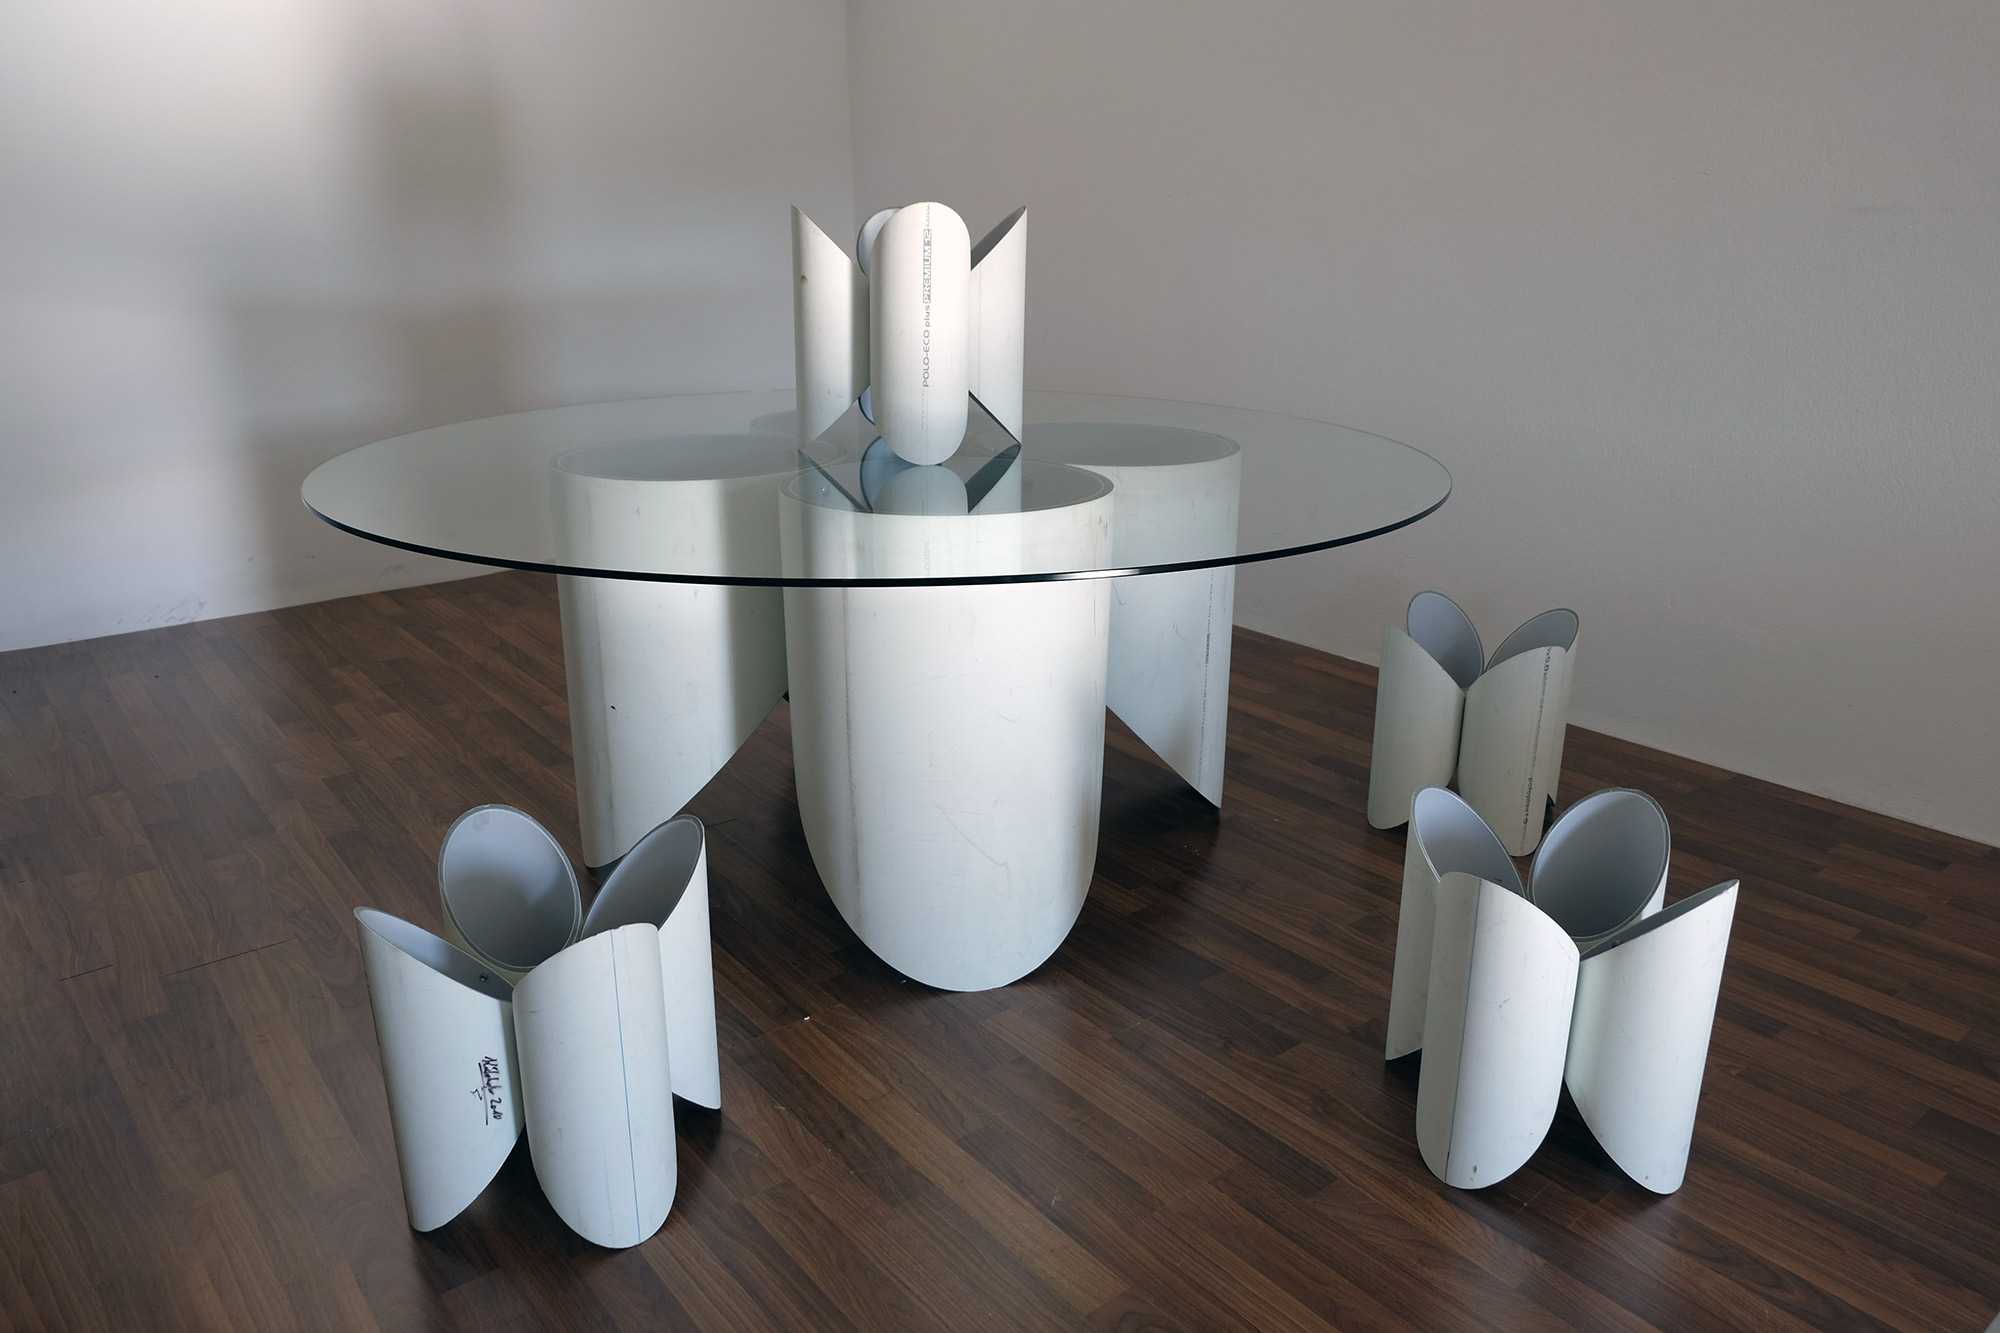 exclusive-furniture-guardian-table-glass-sculpture-statue-contemporary-light-art-design-antique-fine-art-manfred-kili-kielnhofer-7675y